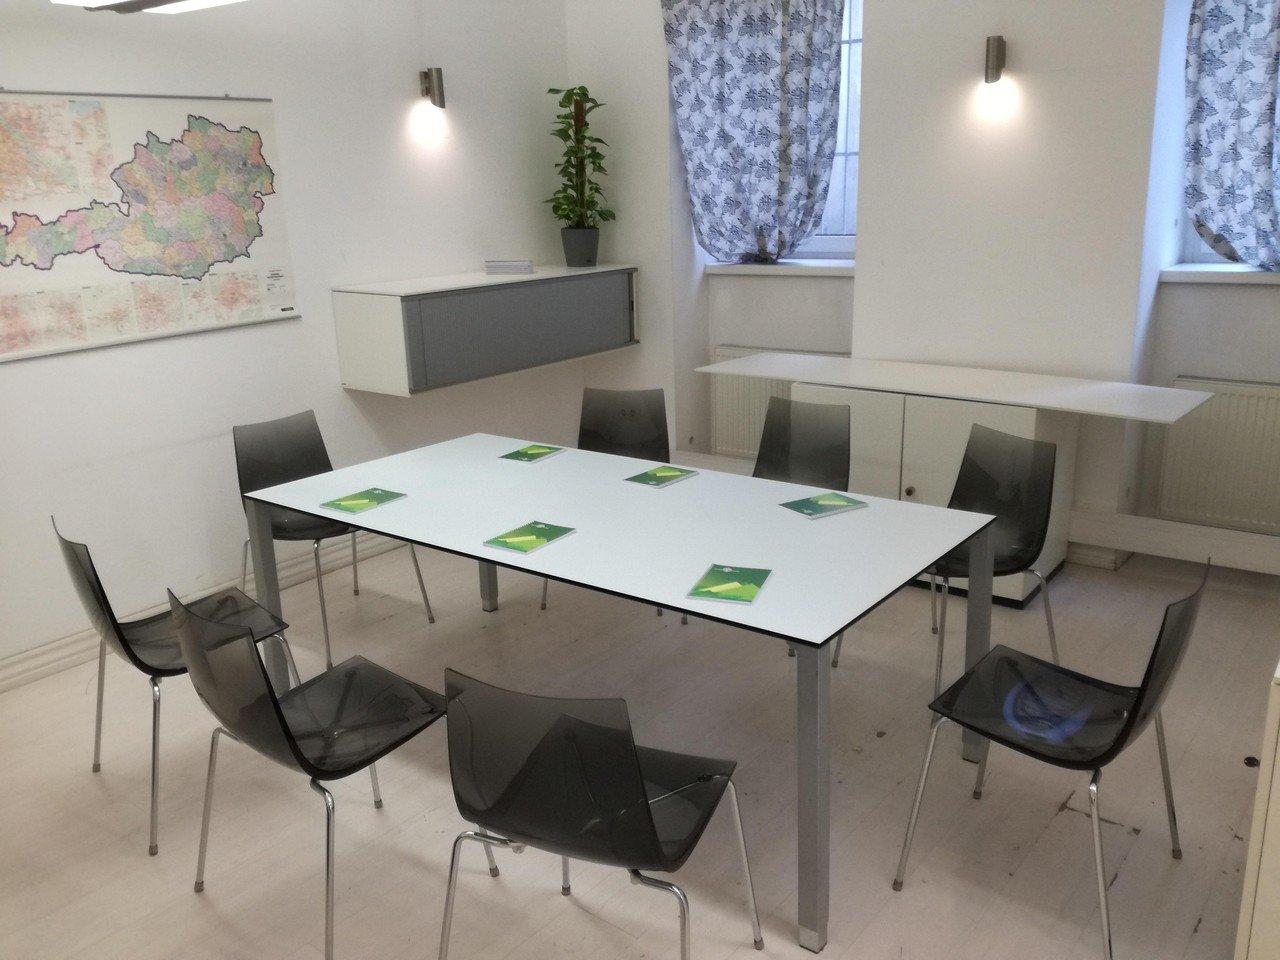 Vienna  Salle de réunion Modern meeting room and quiet office in 8. distrikt image 0